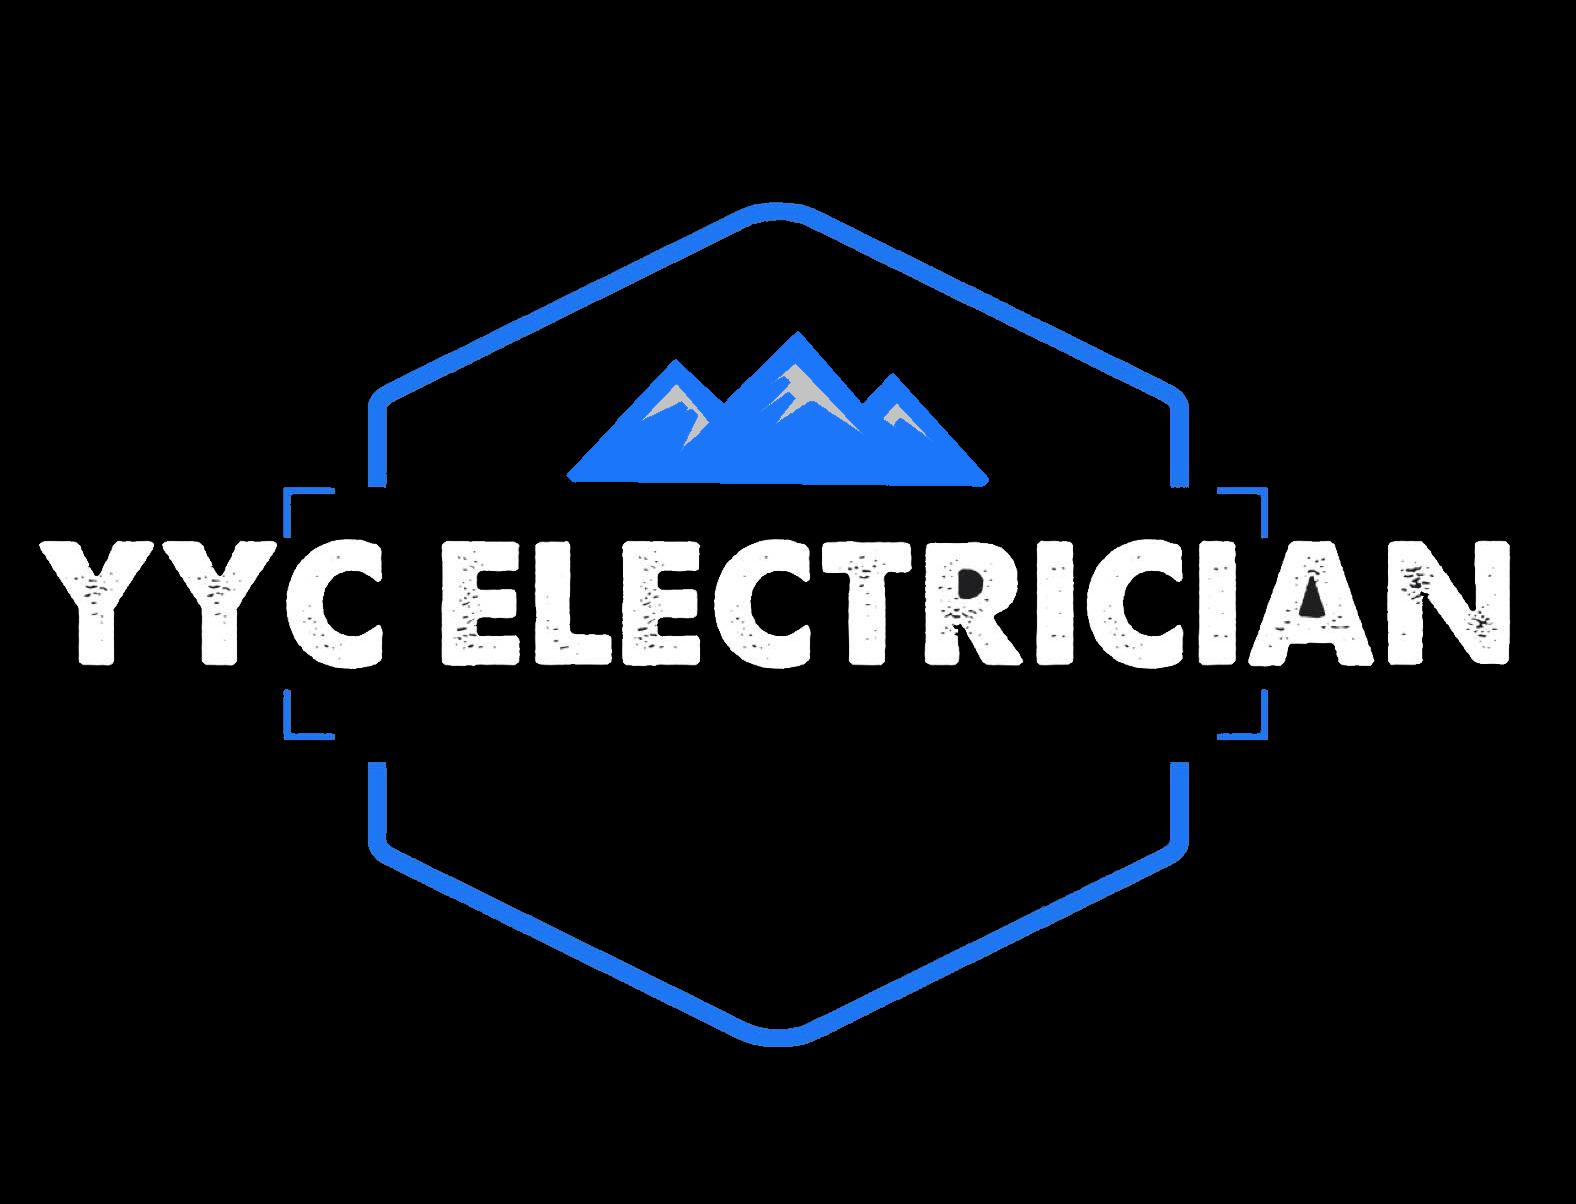 YYC ELECTRICIAN